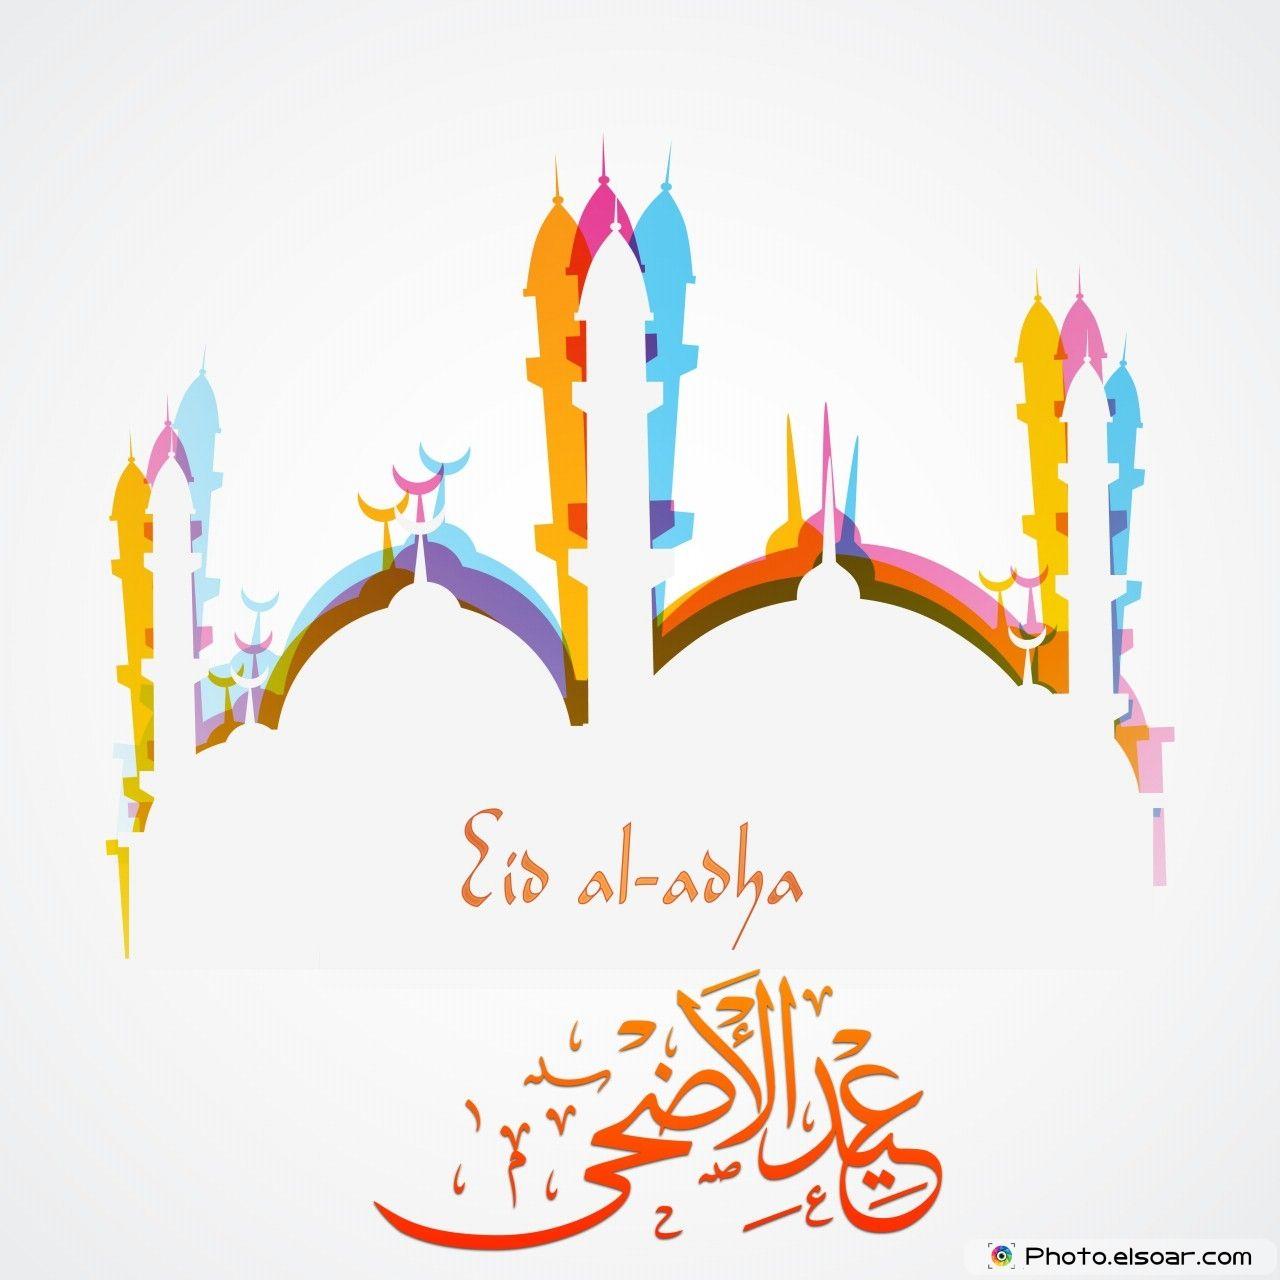 10 Luxury Eid Al Adha Collection Images 2014 Dengan Gambar Kartu